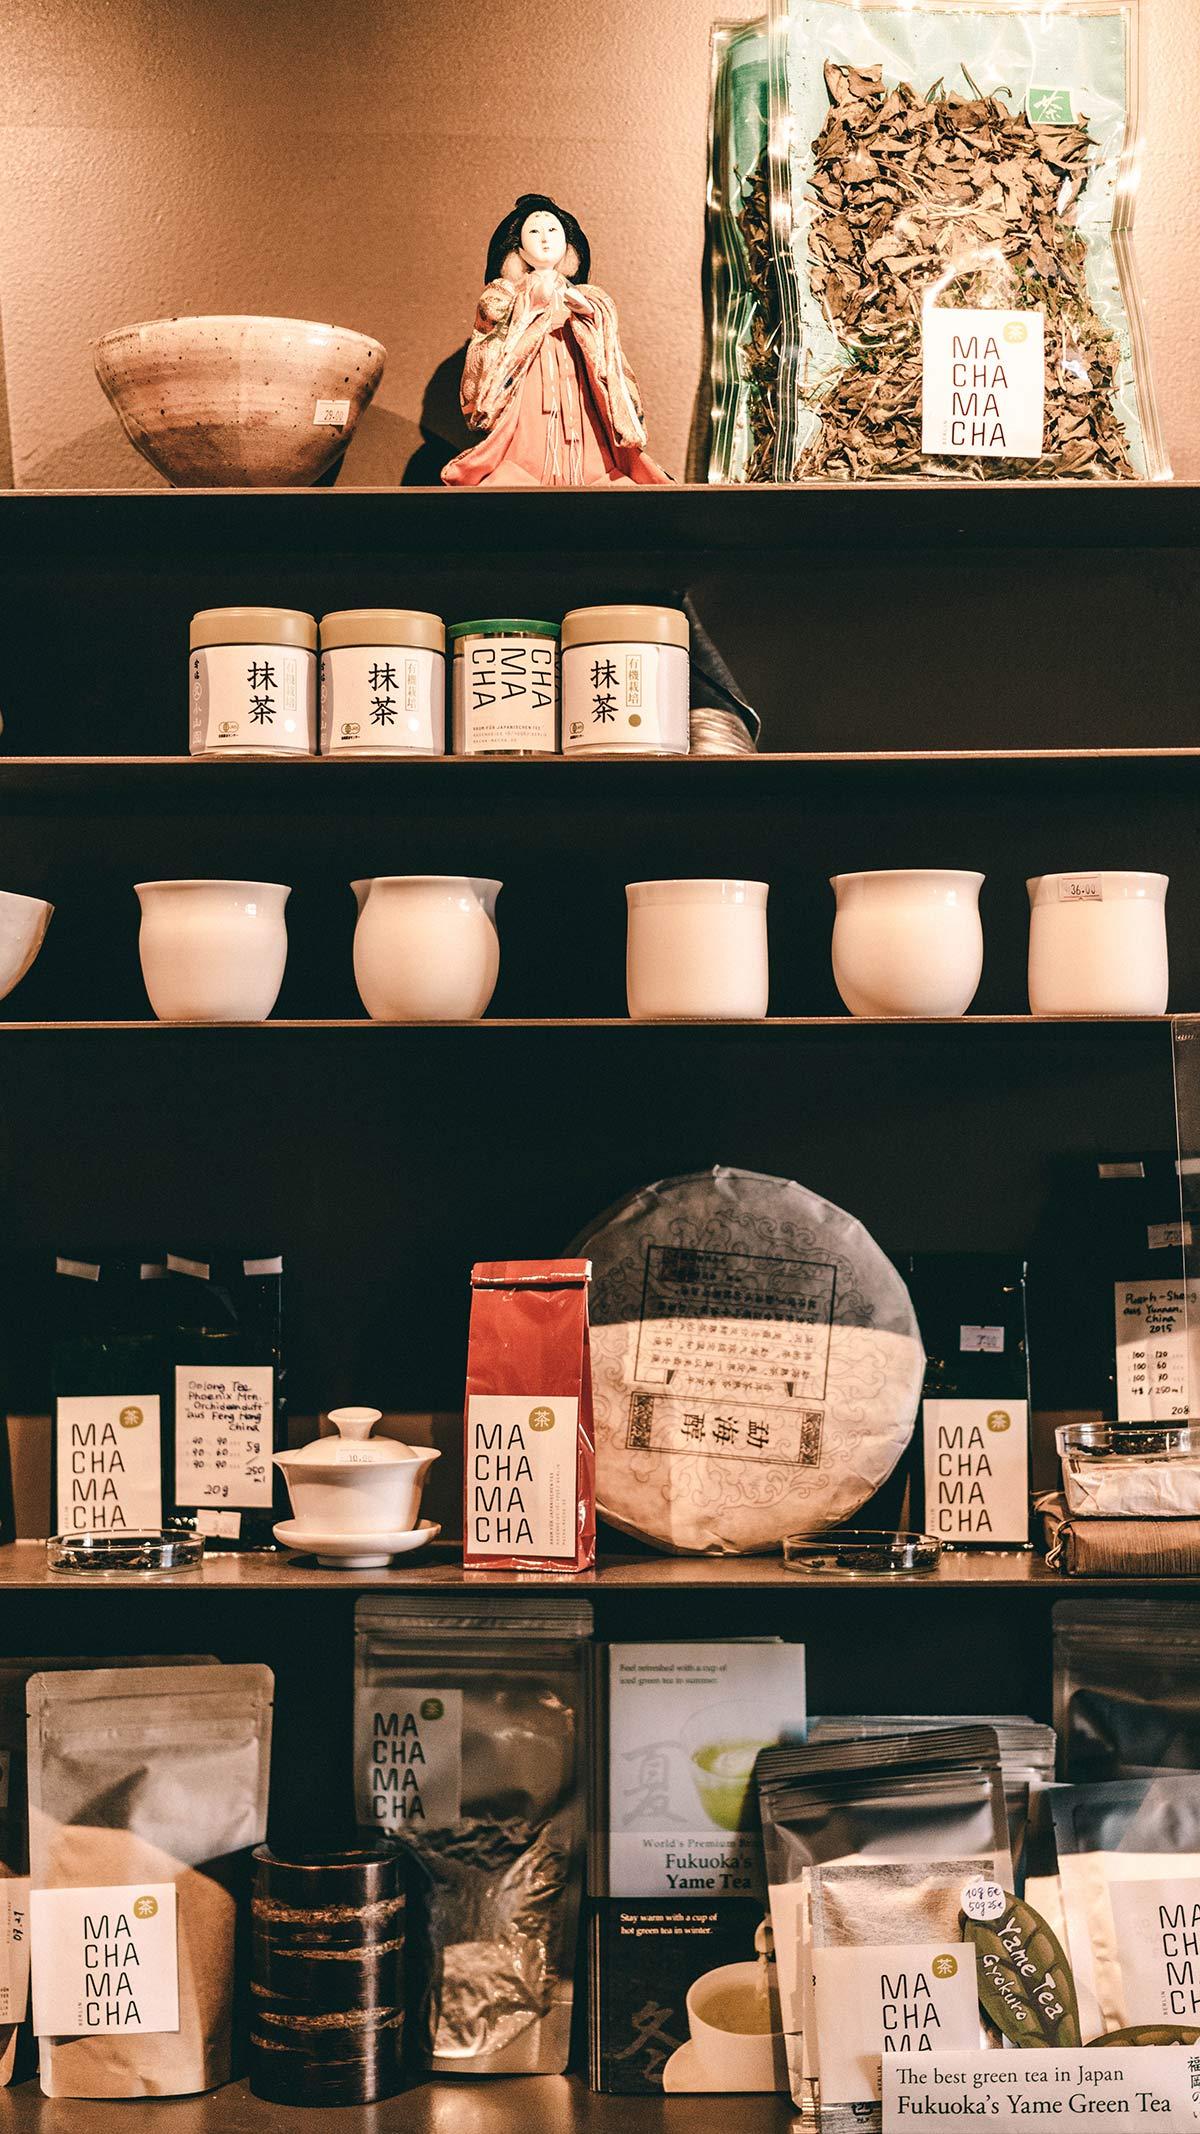 Teeladen Macha Macha Hasenheide